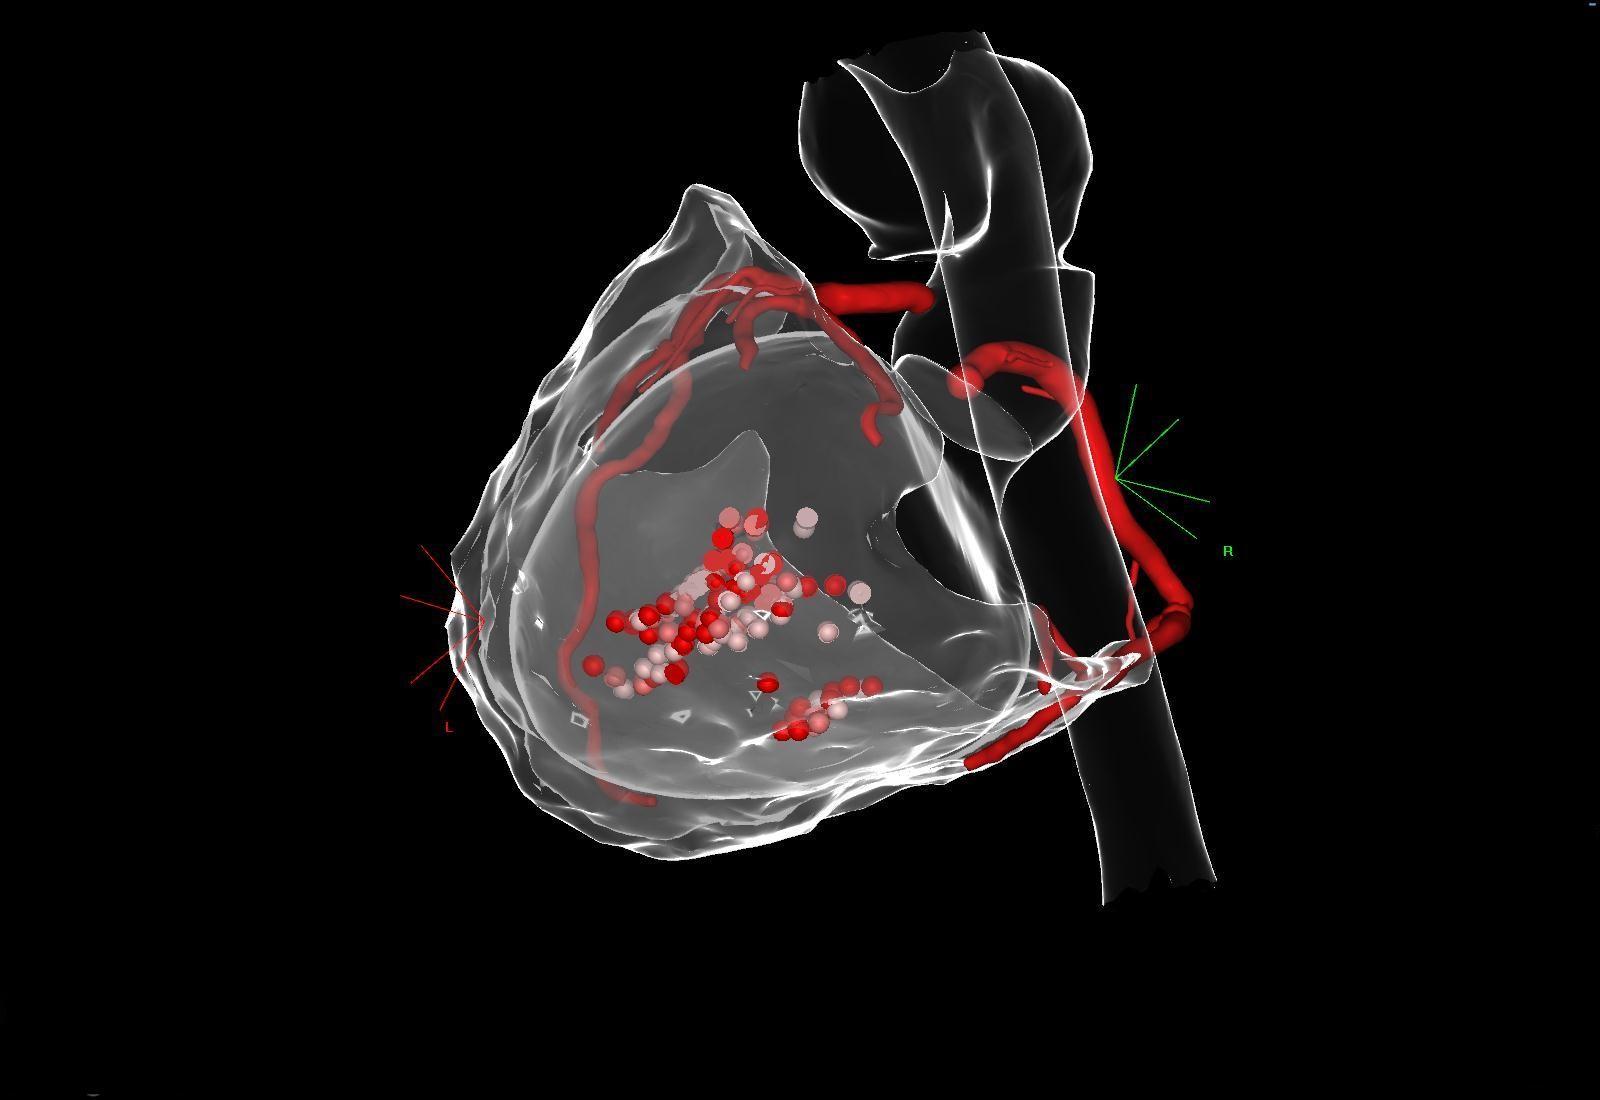 Ablation de flutter cicatriciel sur cardiopathie congénitale complexe de type Fontan